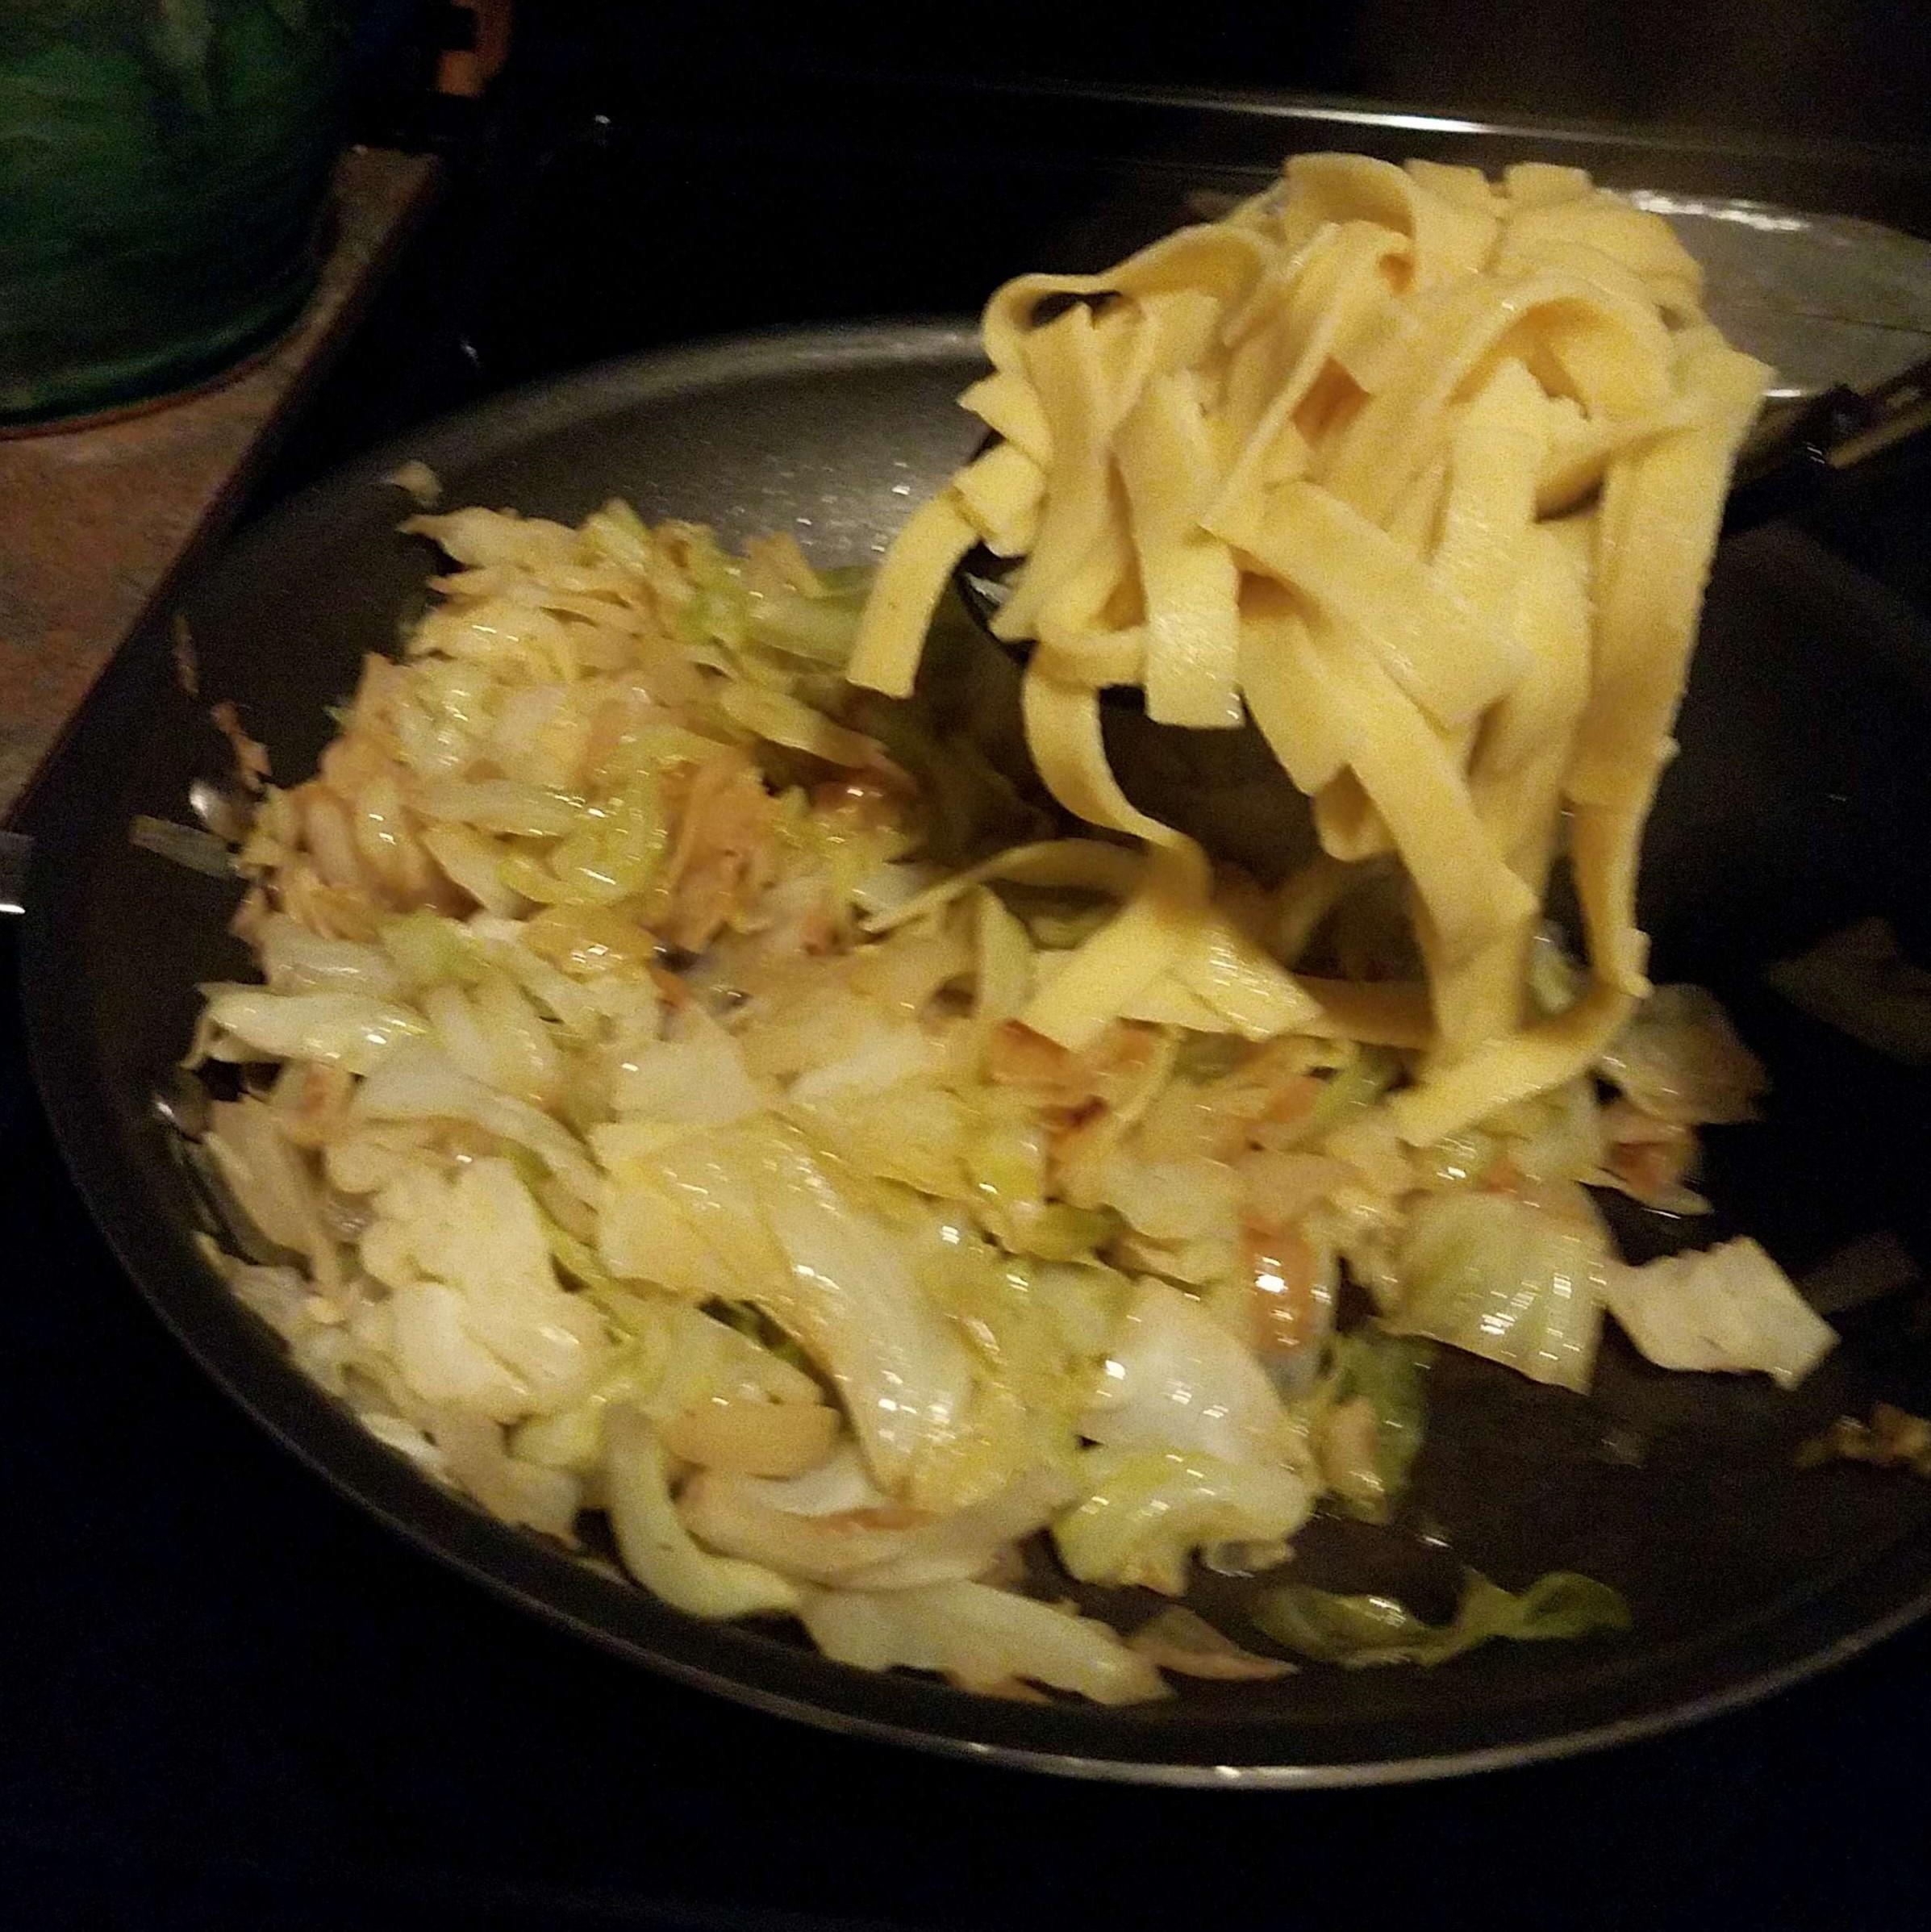 Halushki (Vegetarian Fried Cabbage and Noodles)